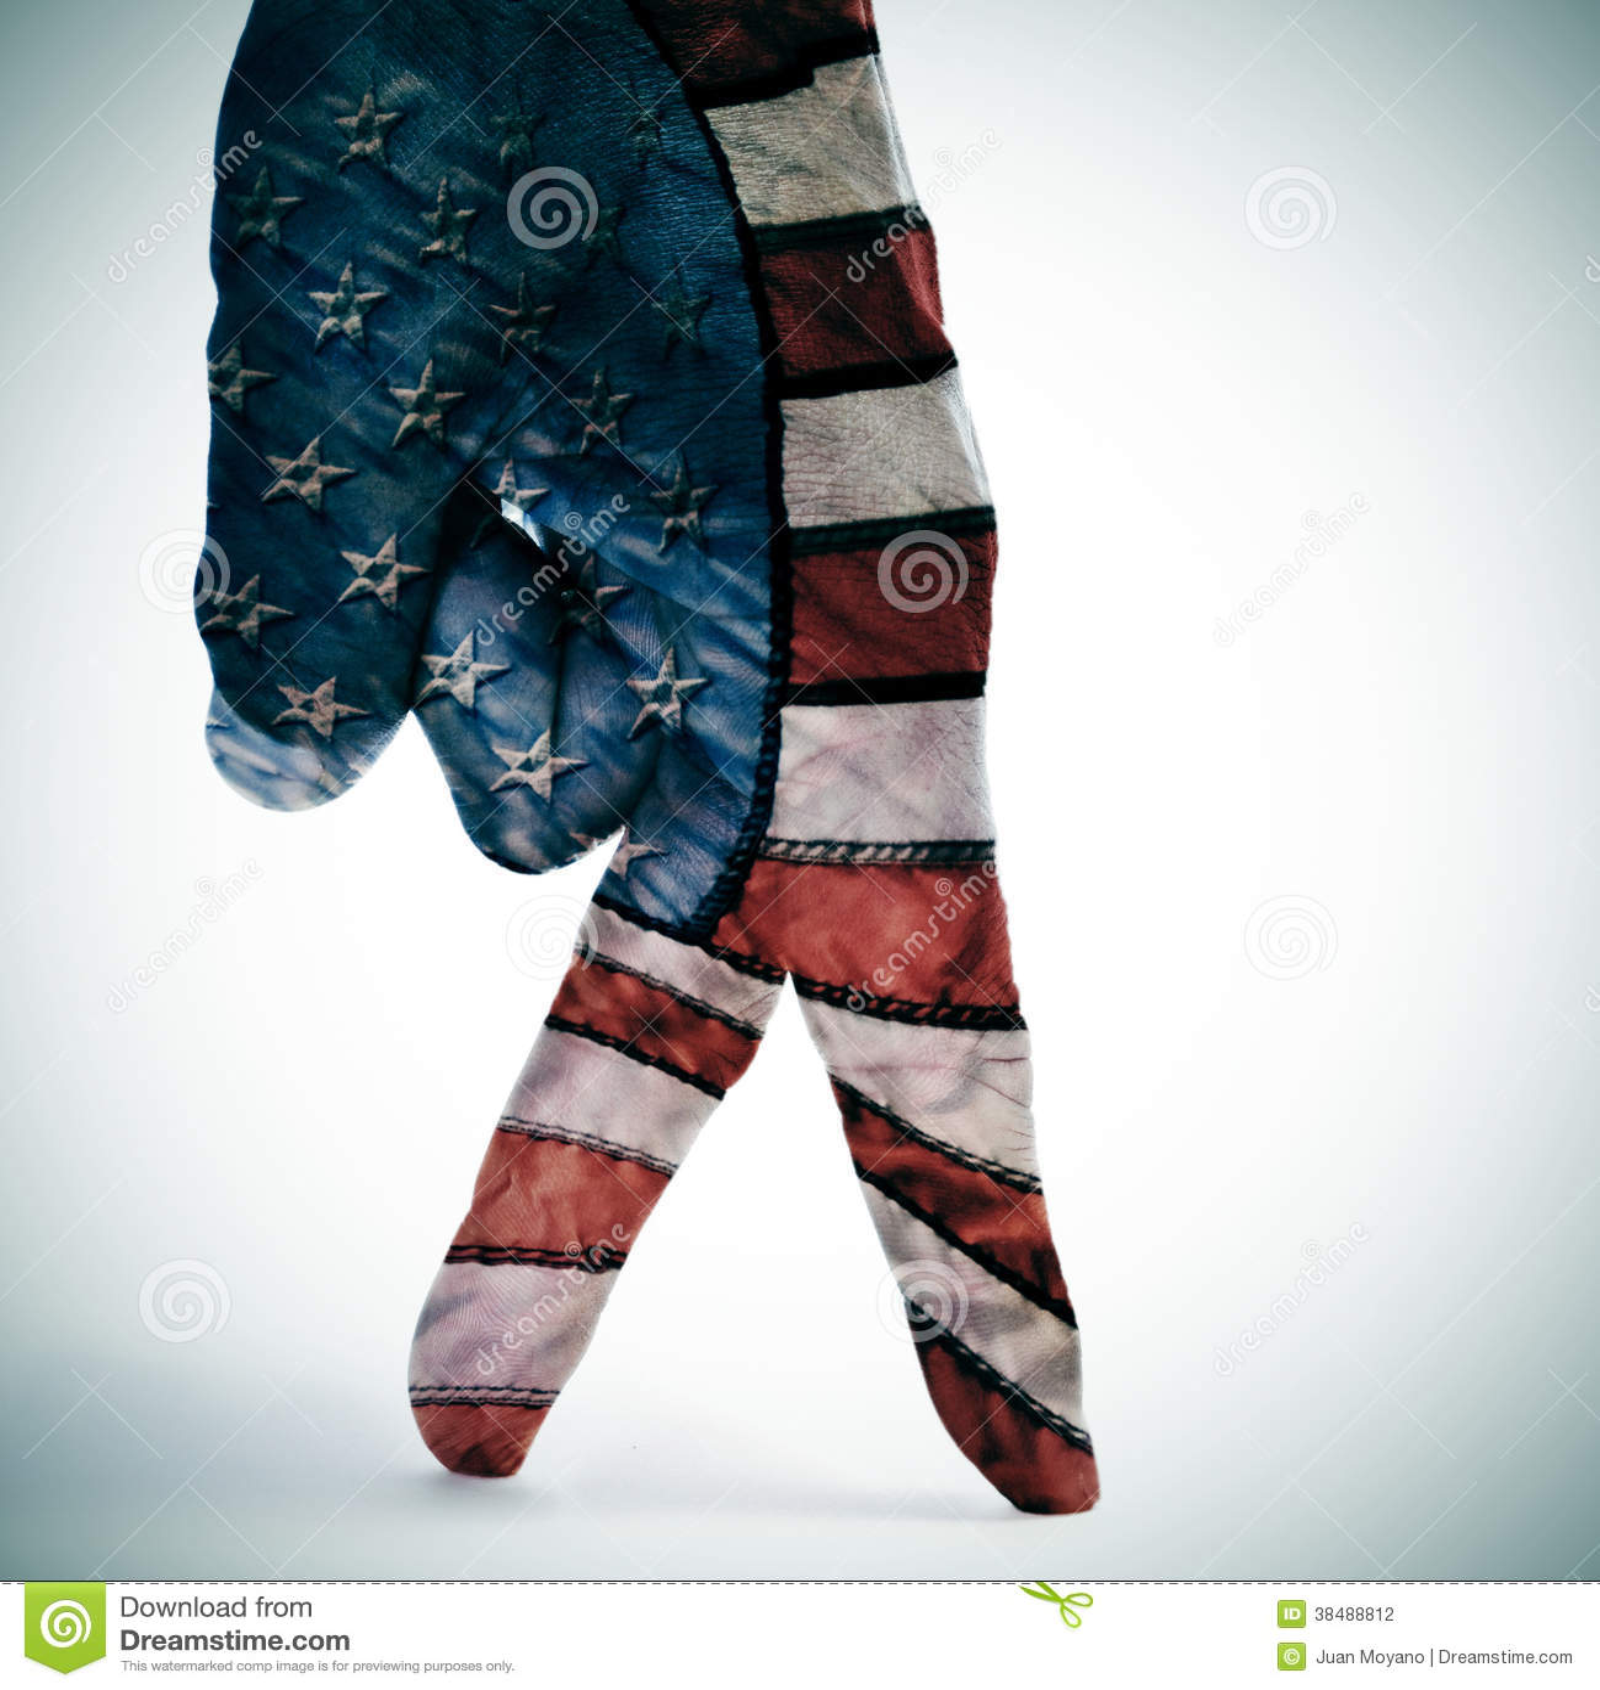 American flag walking